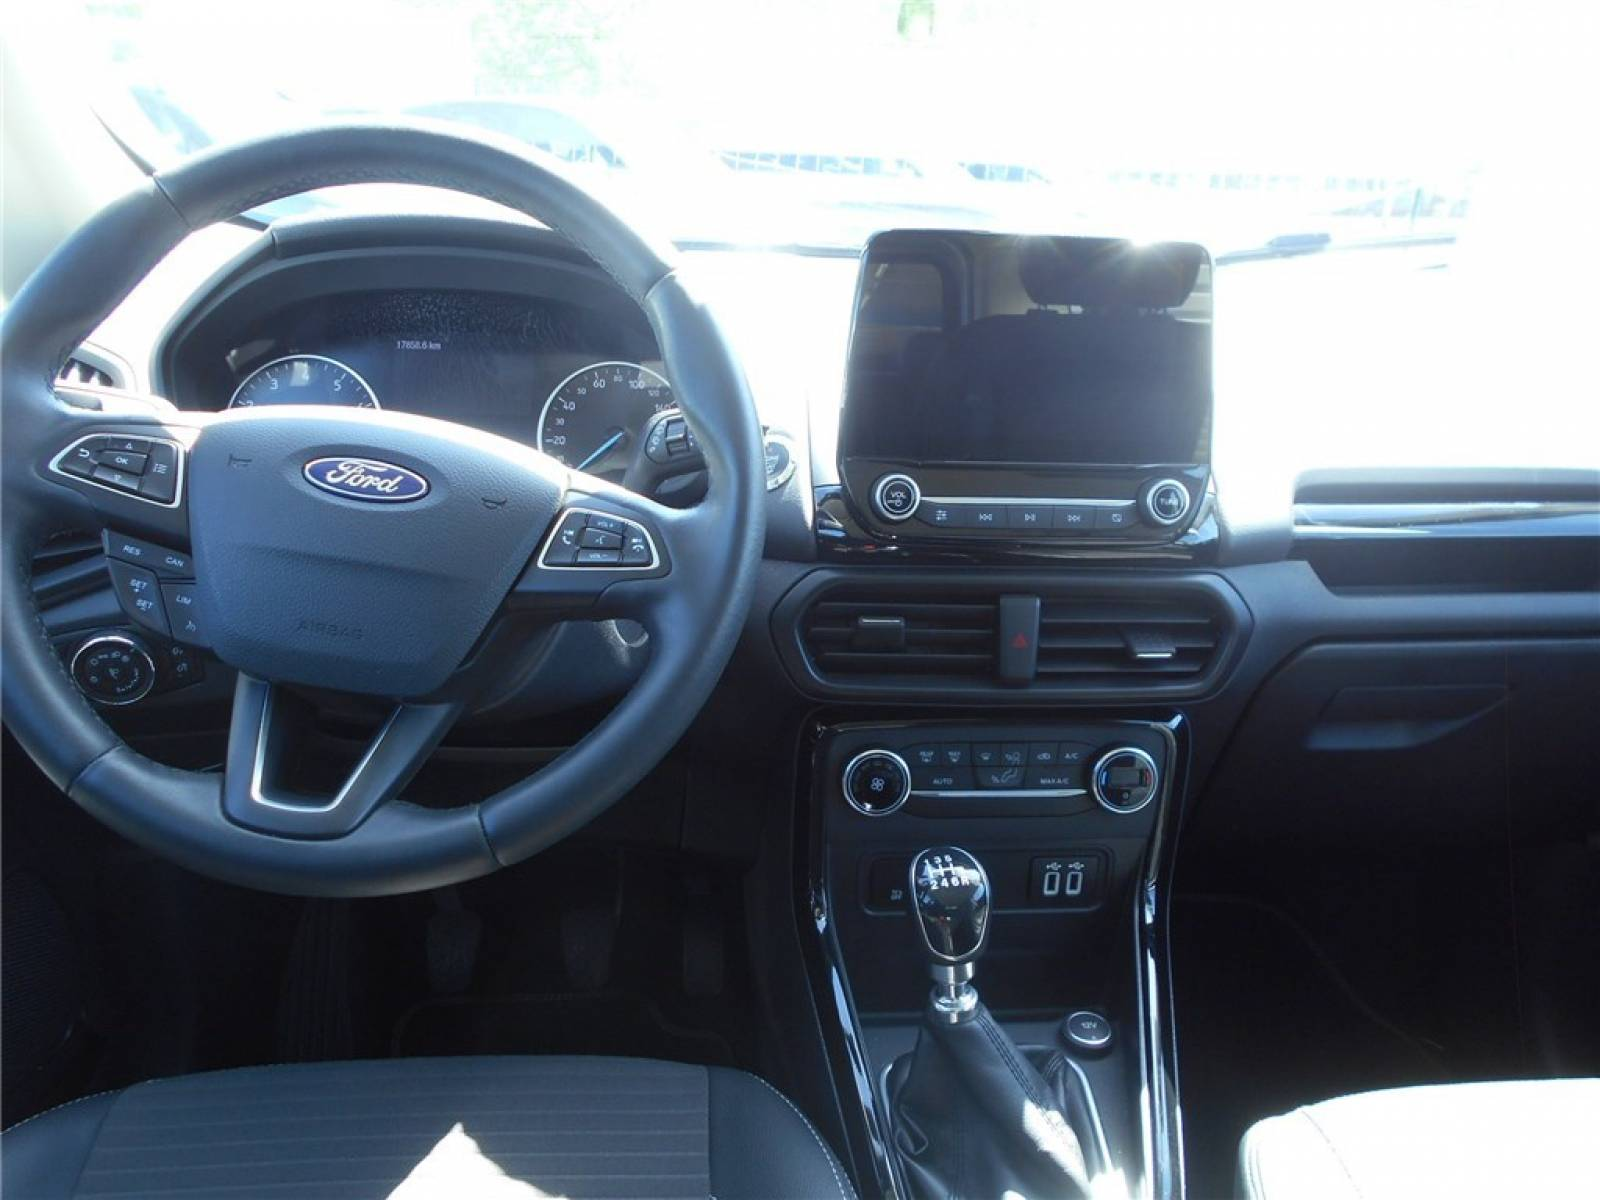 FORD EcoSport 1.0 EcoBoost 125 BVM6 - véhicule d'occasion - Groupe Guillet - Chalon Automobiles - 71100 - Chalon-sur-Saône - 7